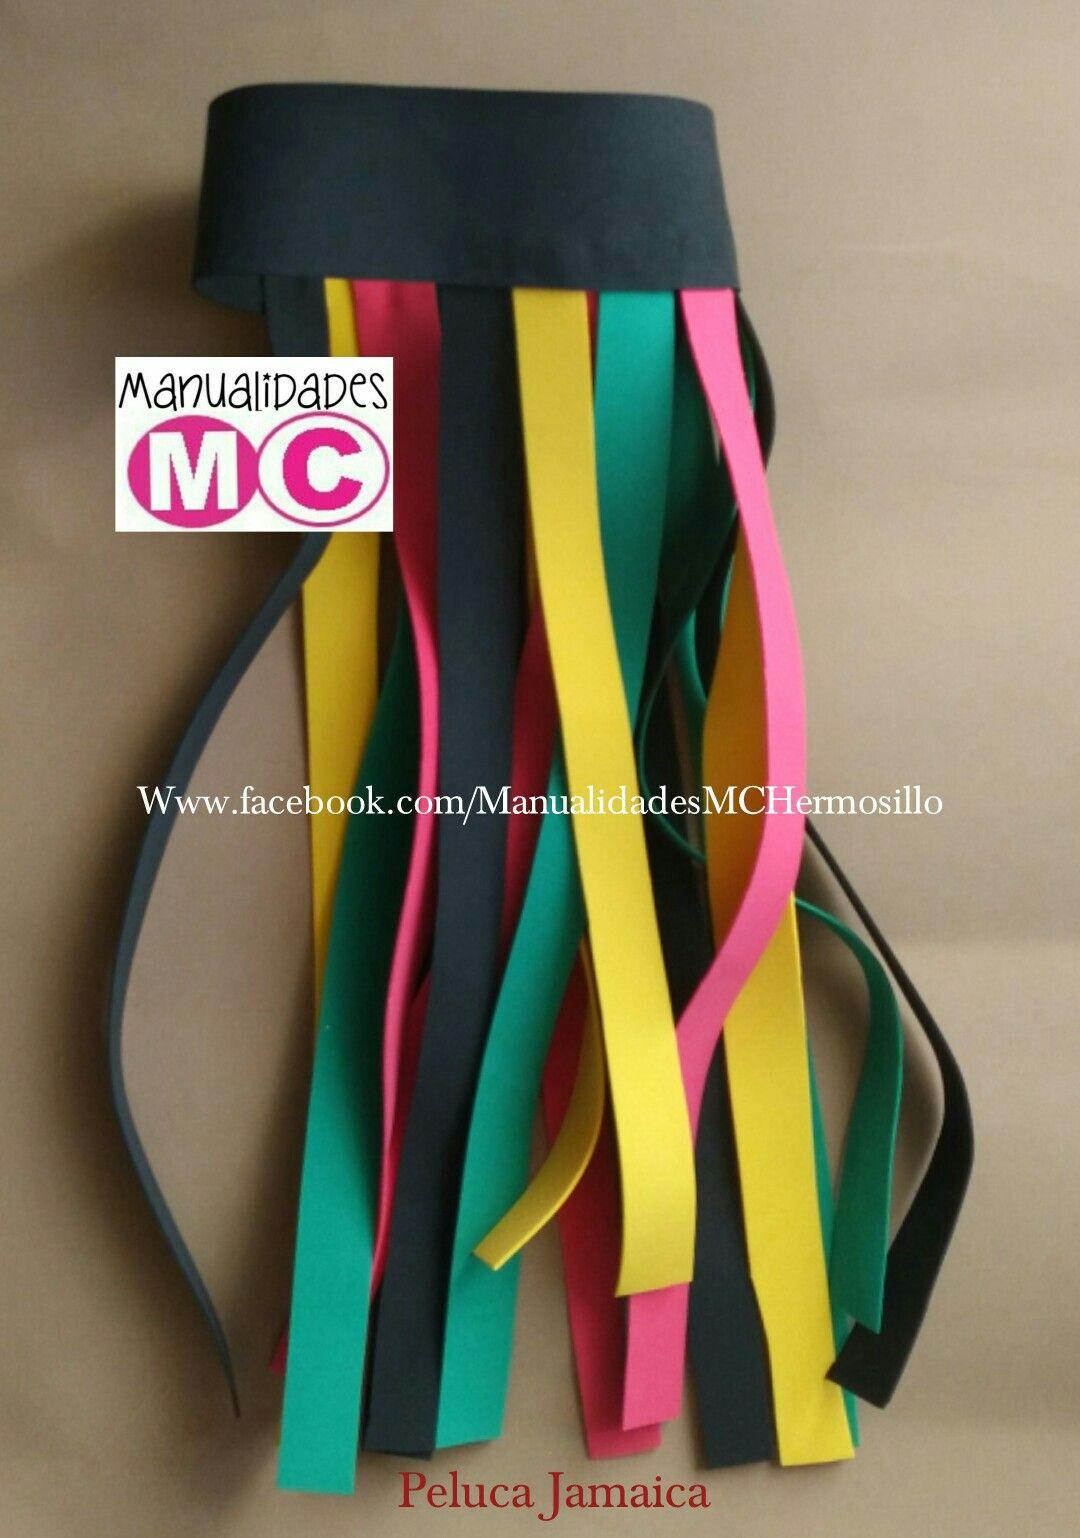 Peluca De Fomi Jamaica Art Craft Store Get Directions Manualidades